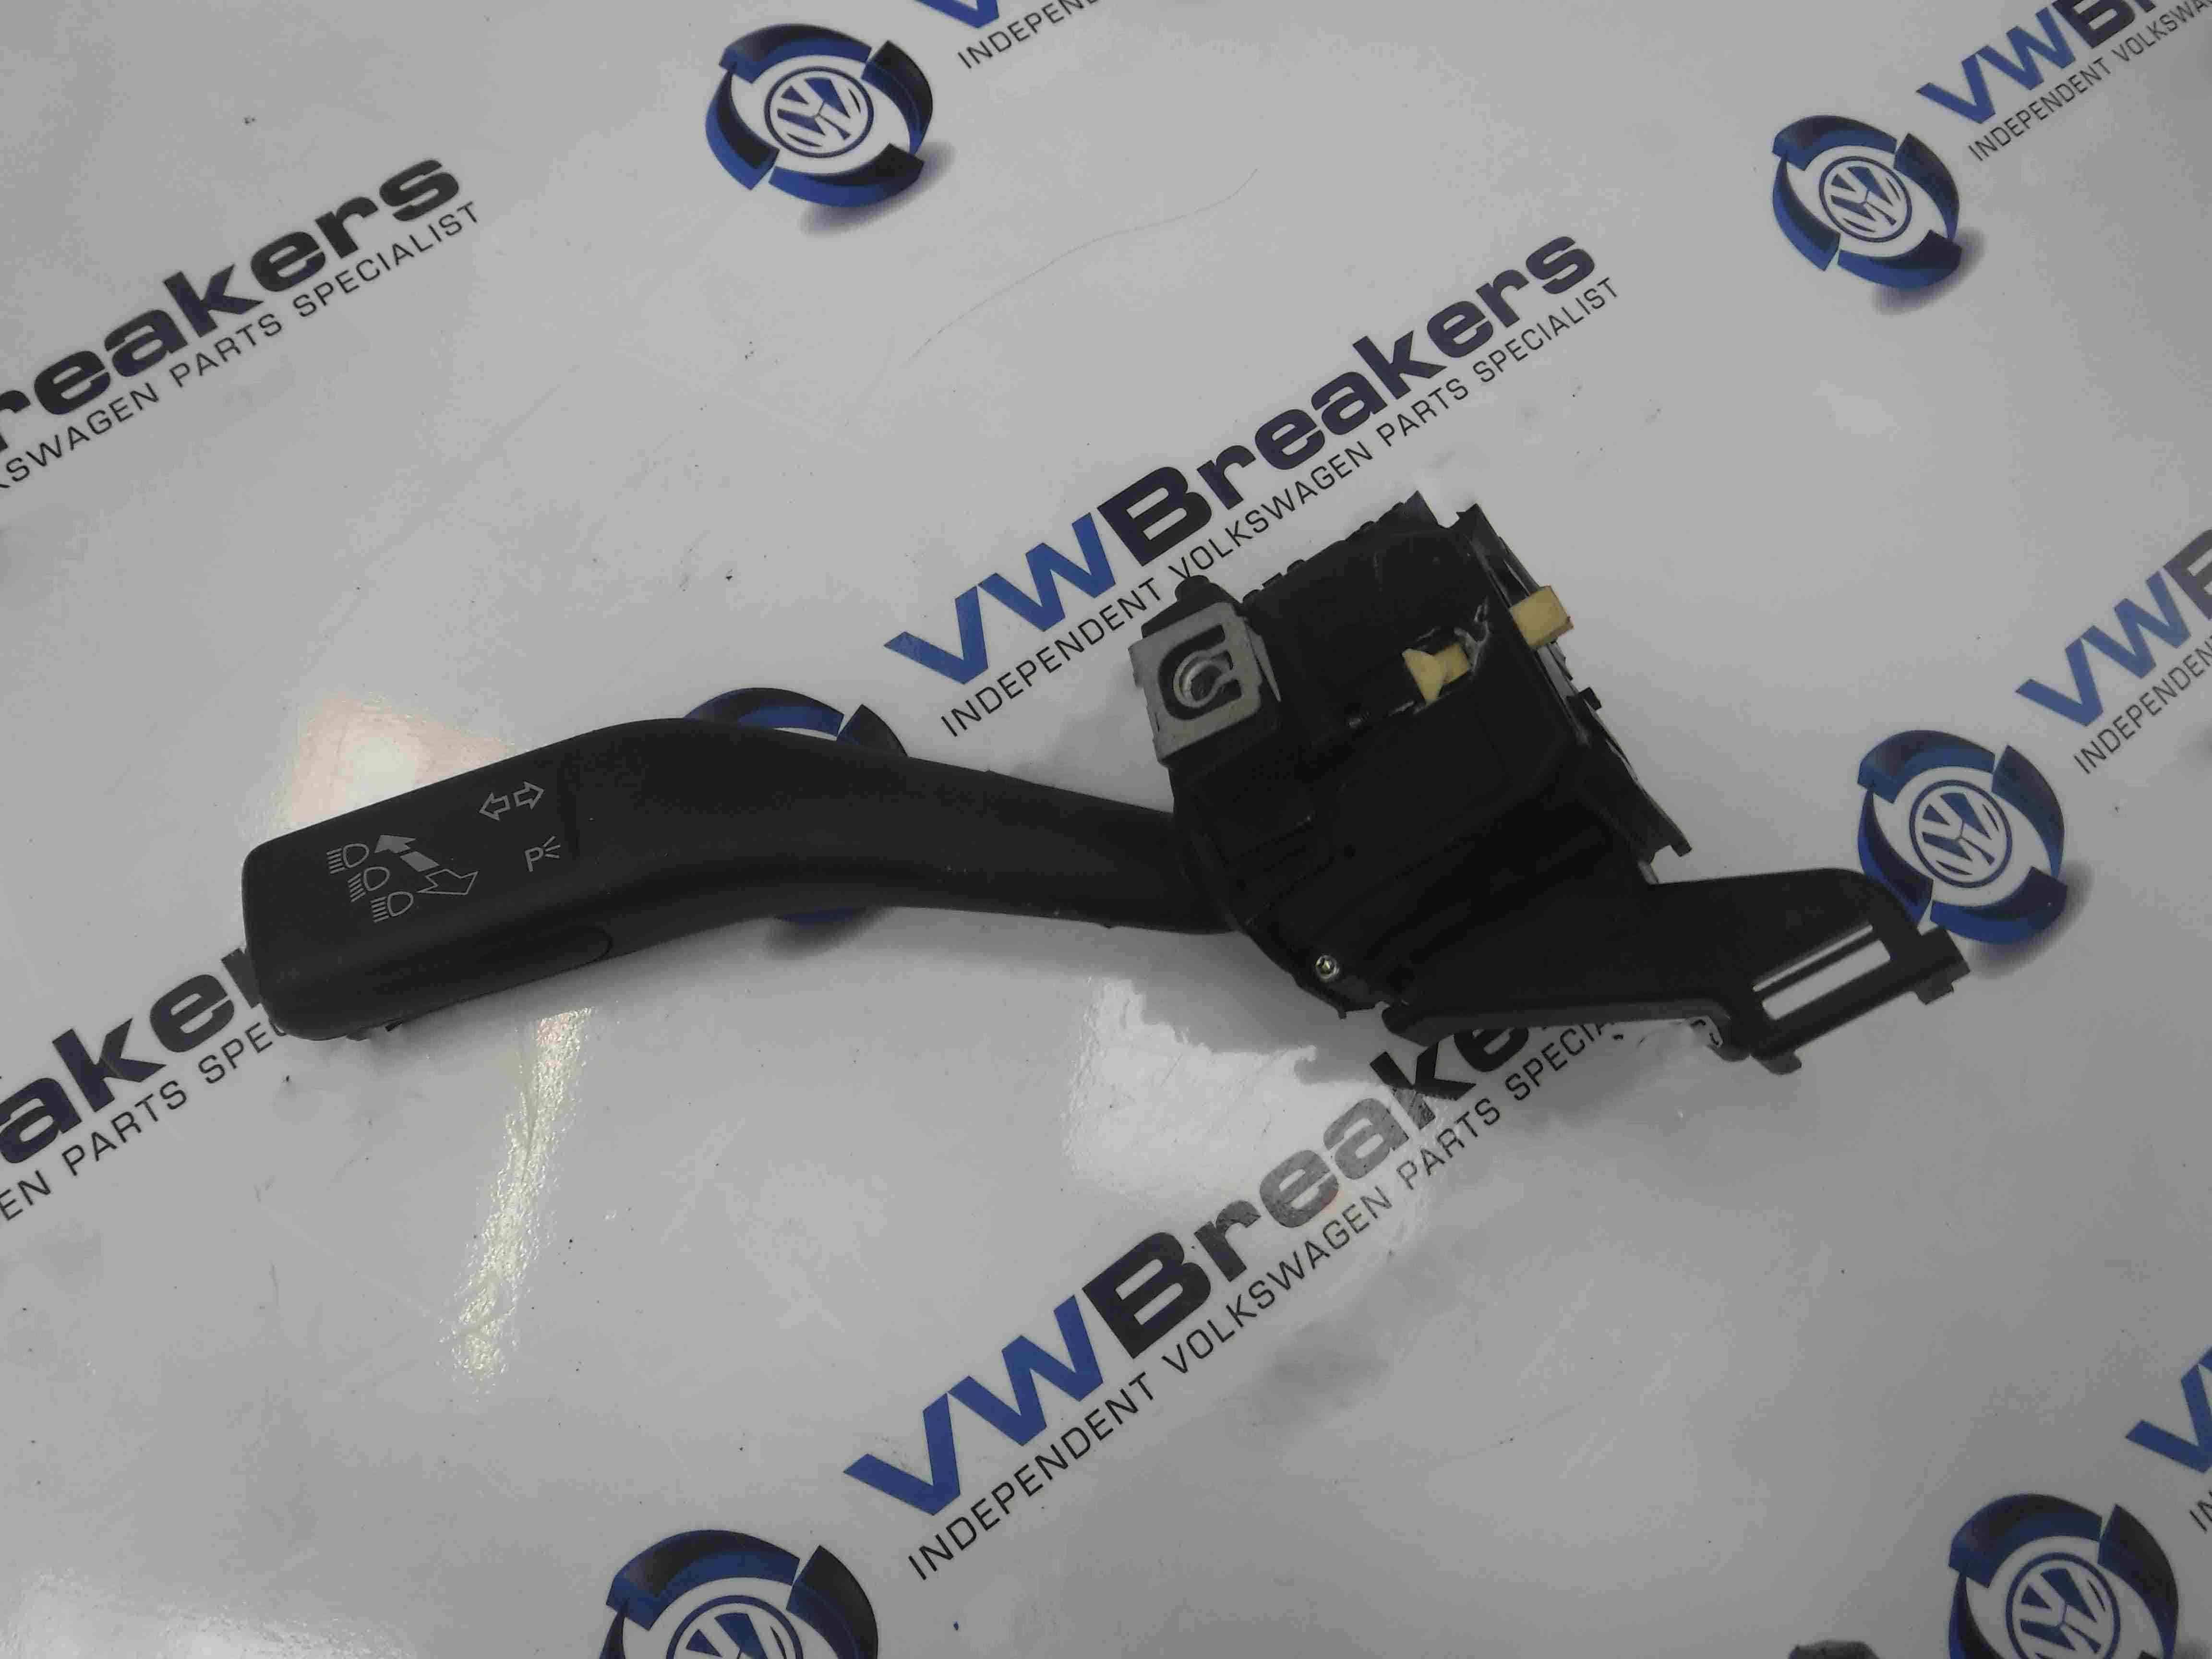 Volkswagen Golf MK6 2009-2012 Headlight Indicator Stalk 1K0953513E